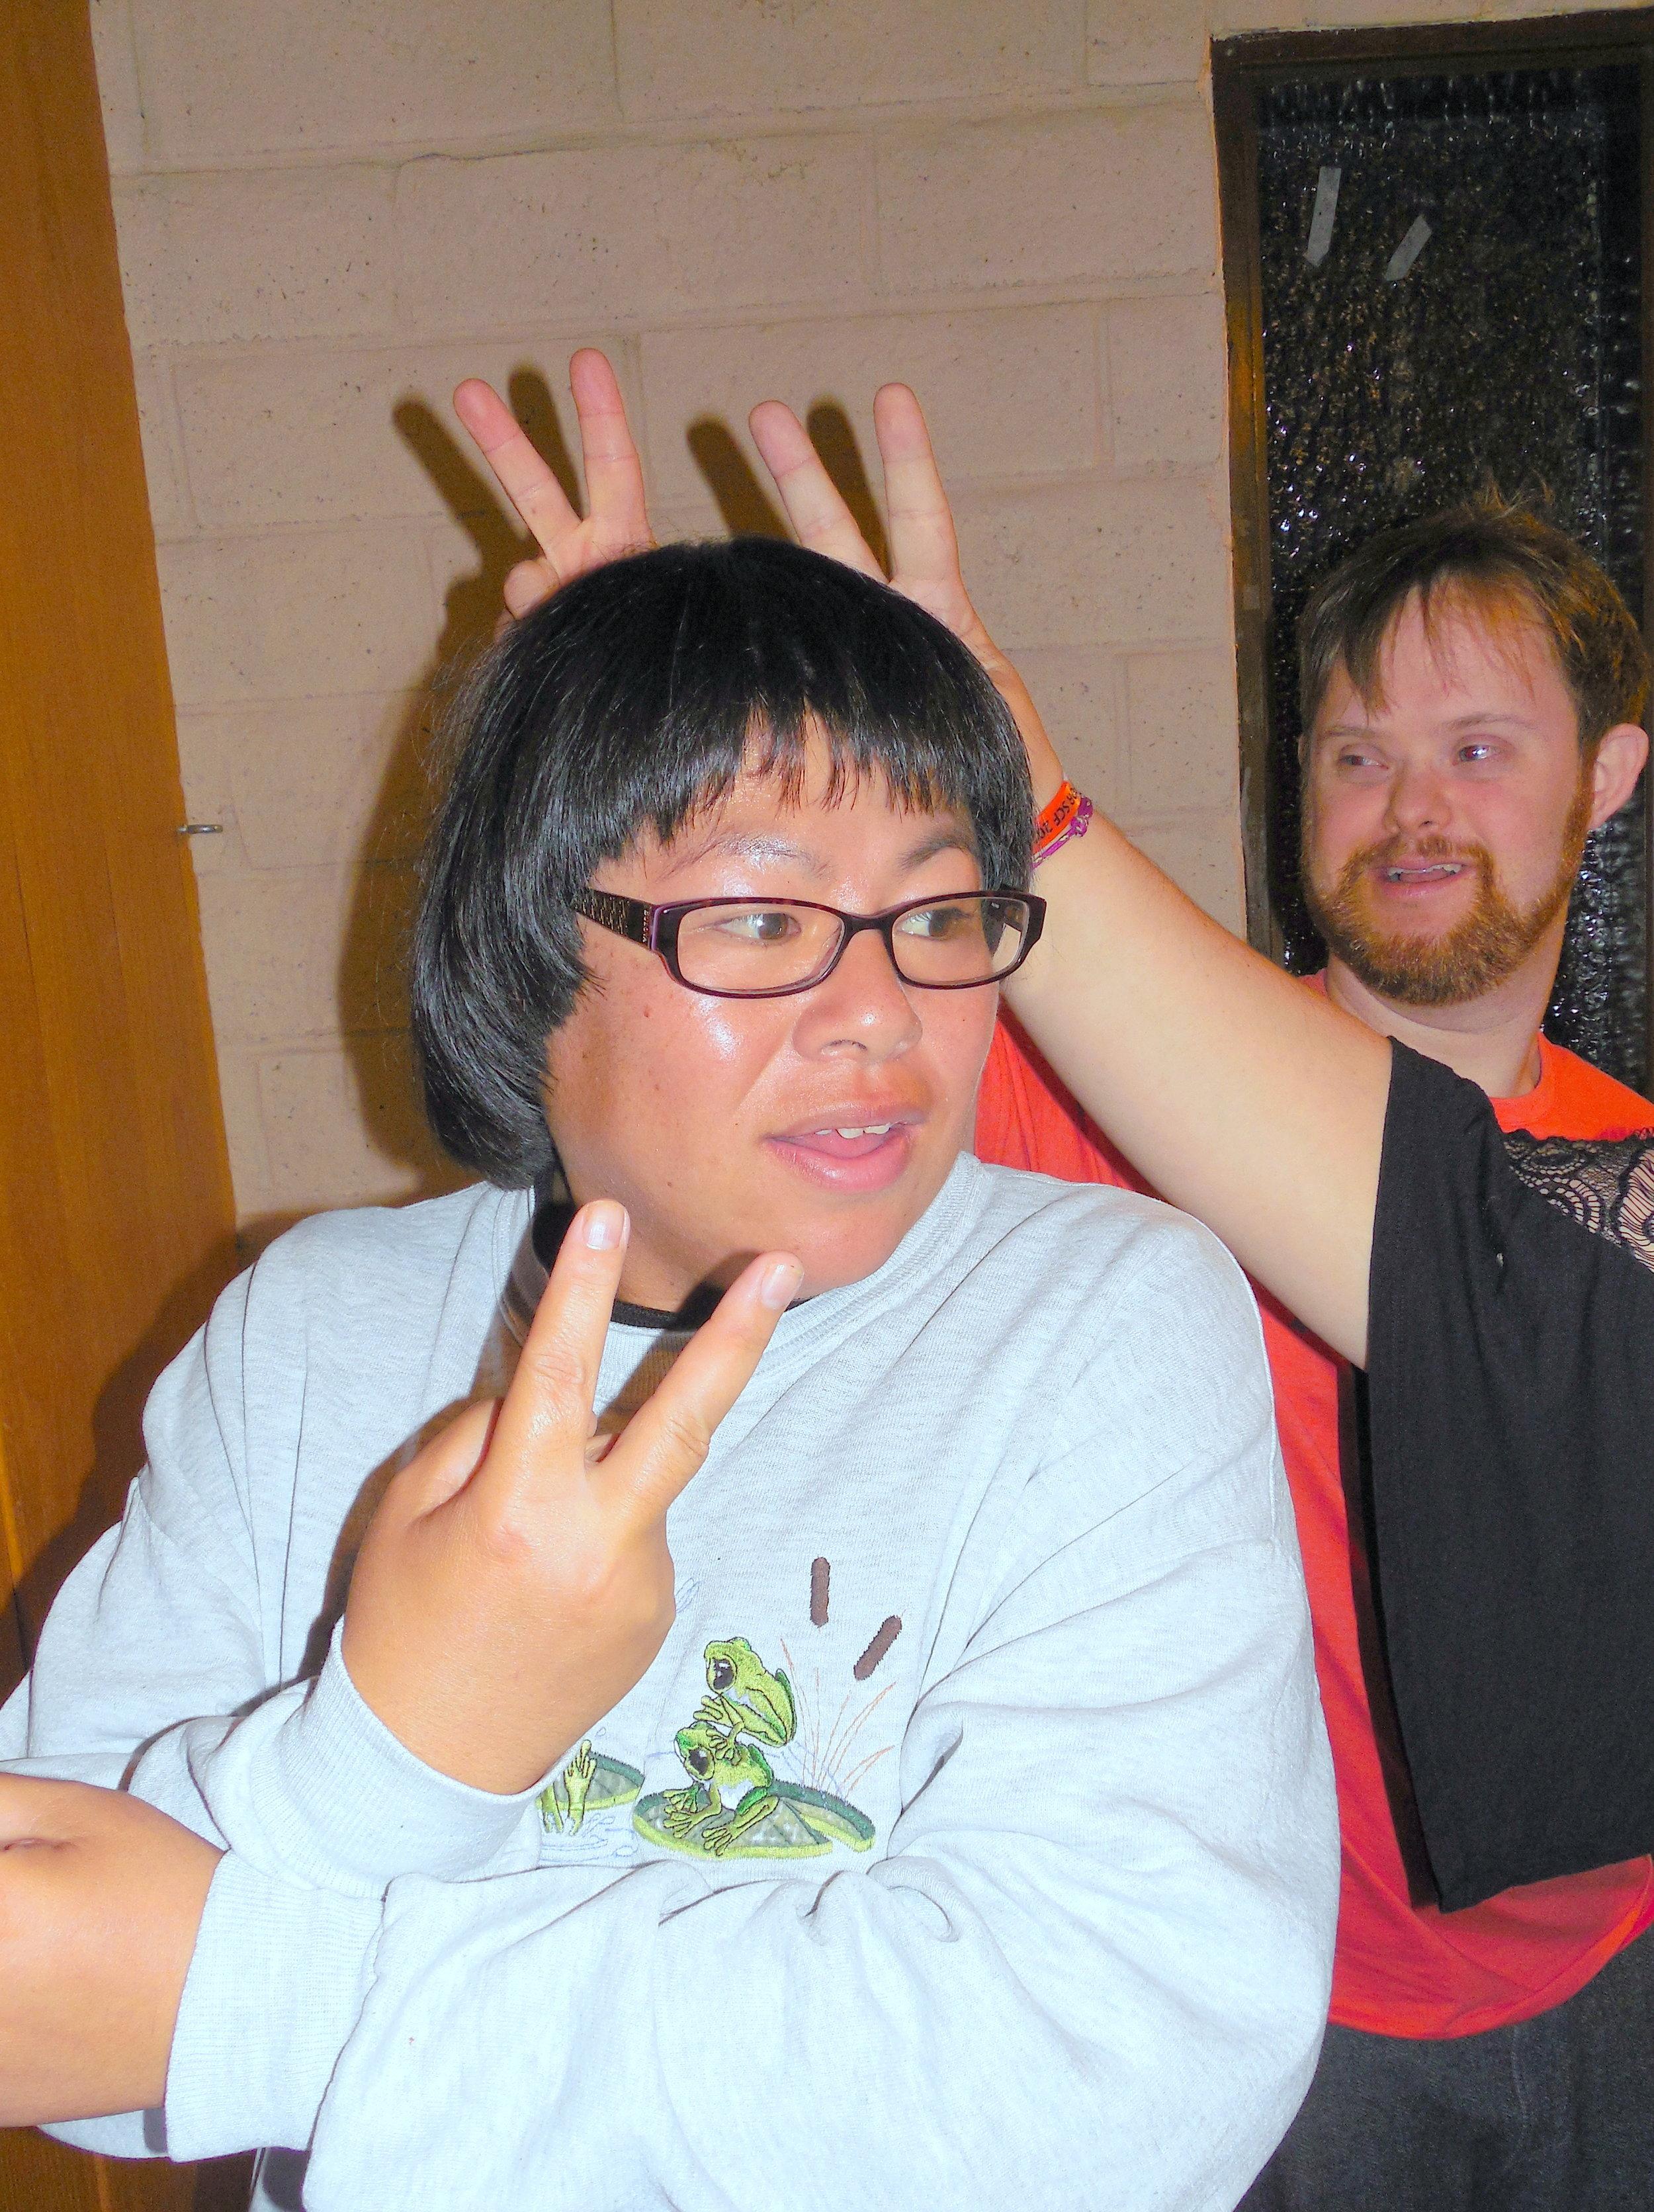 34 Game Night-Stephanie with so many bunny ears-David.jpg